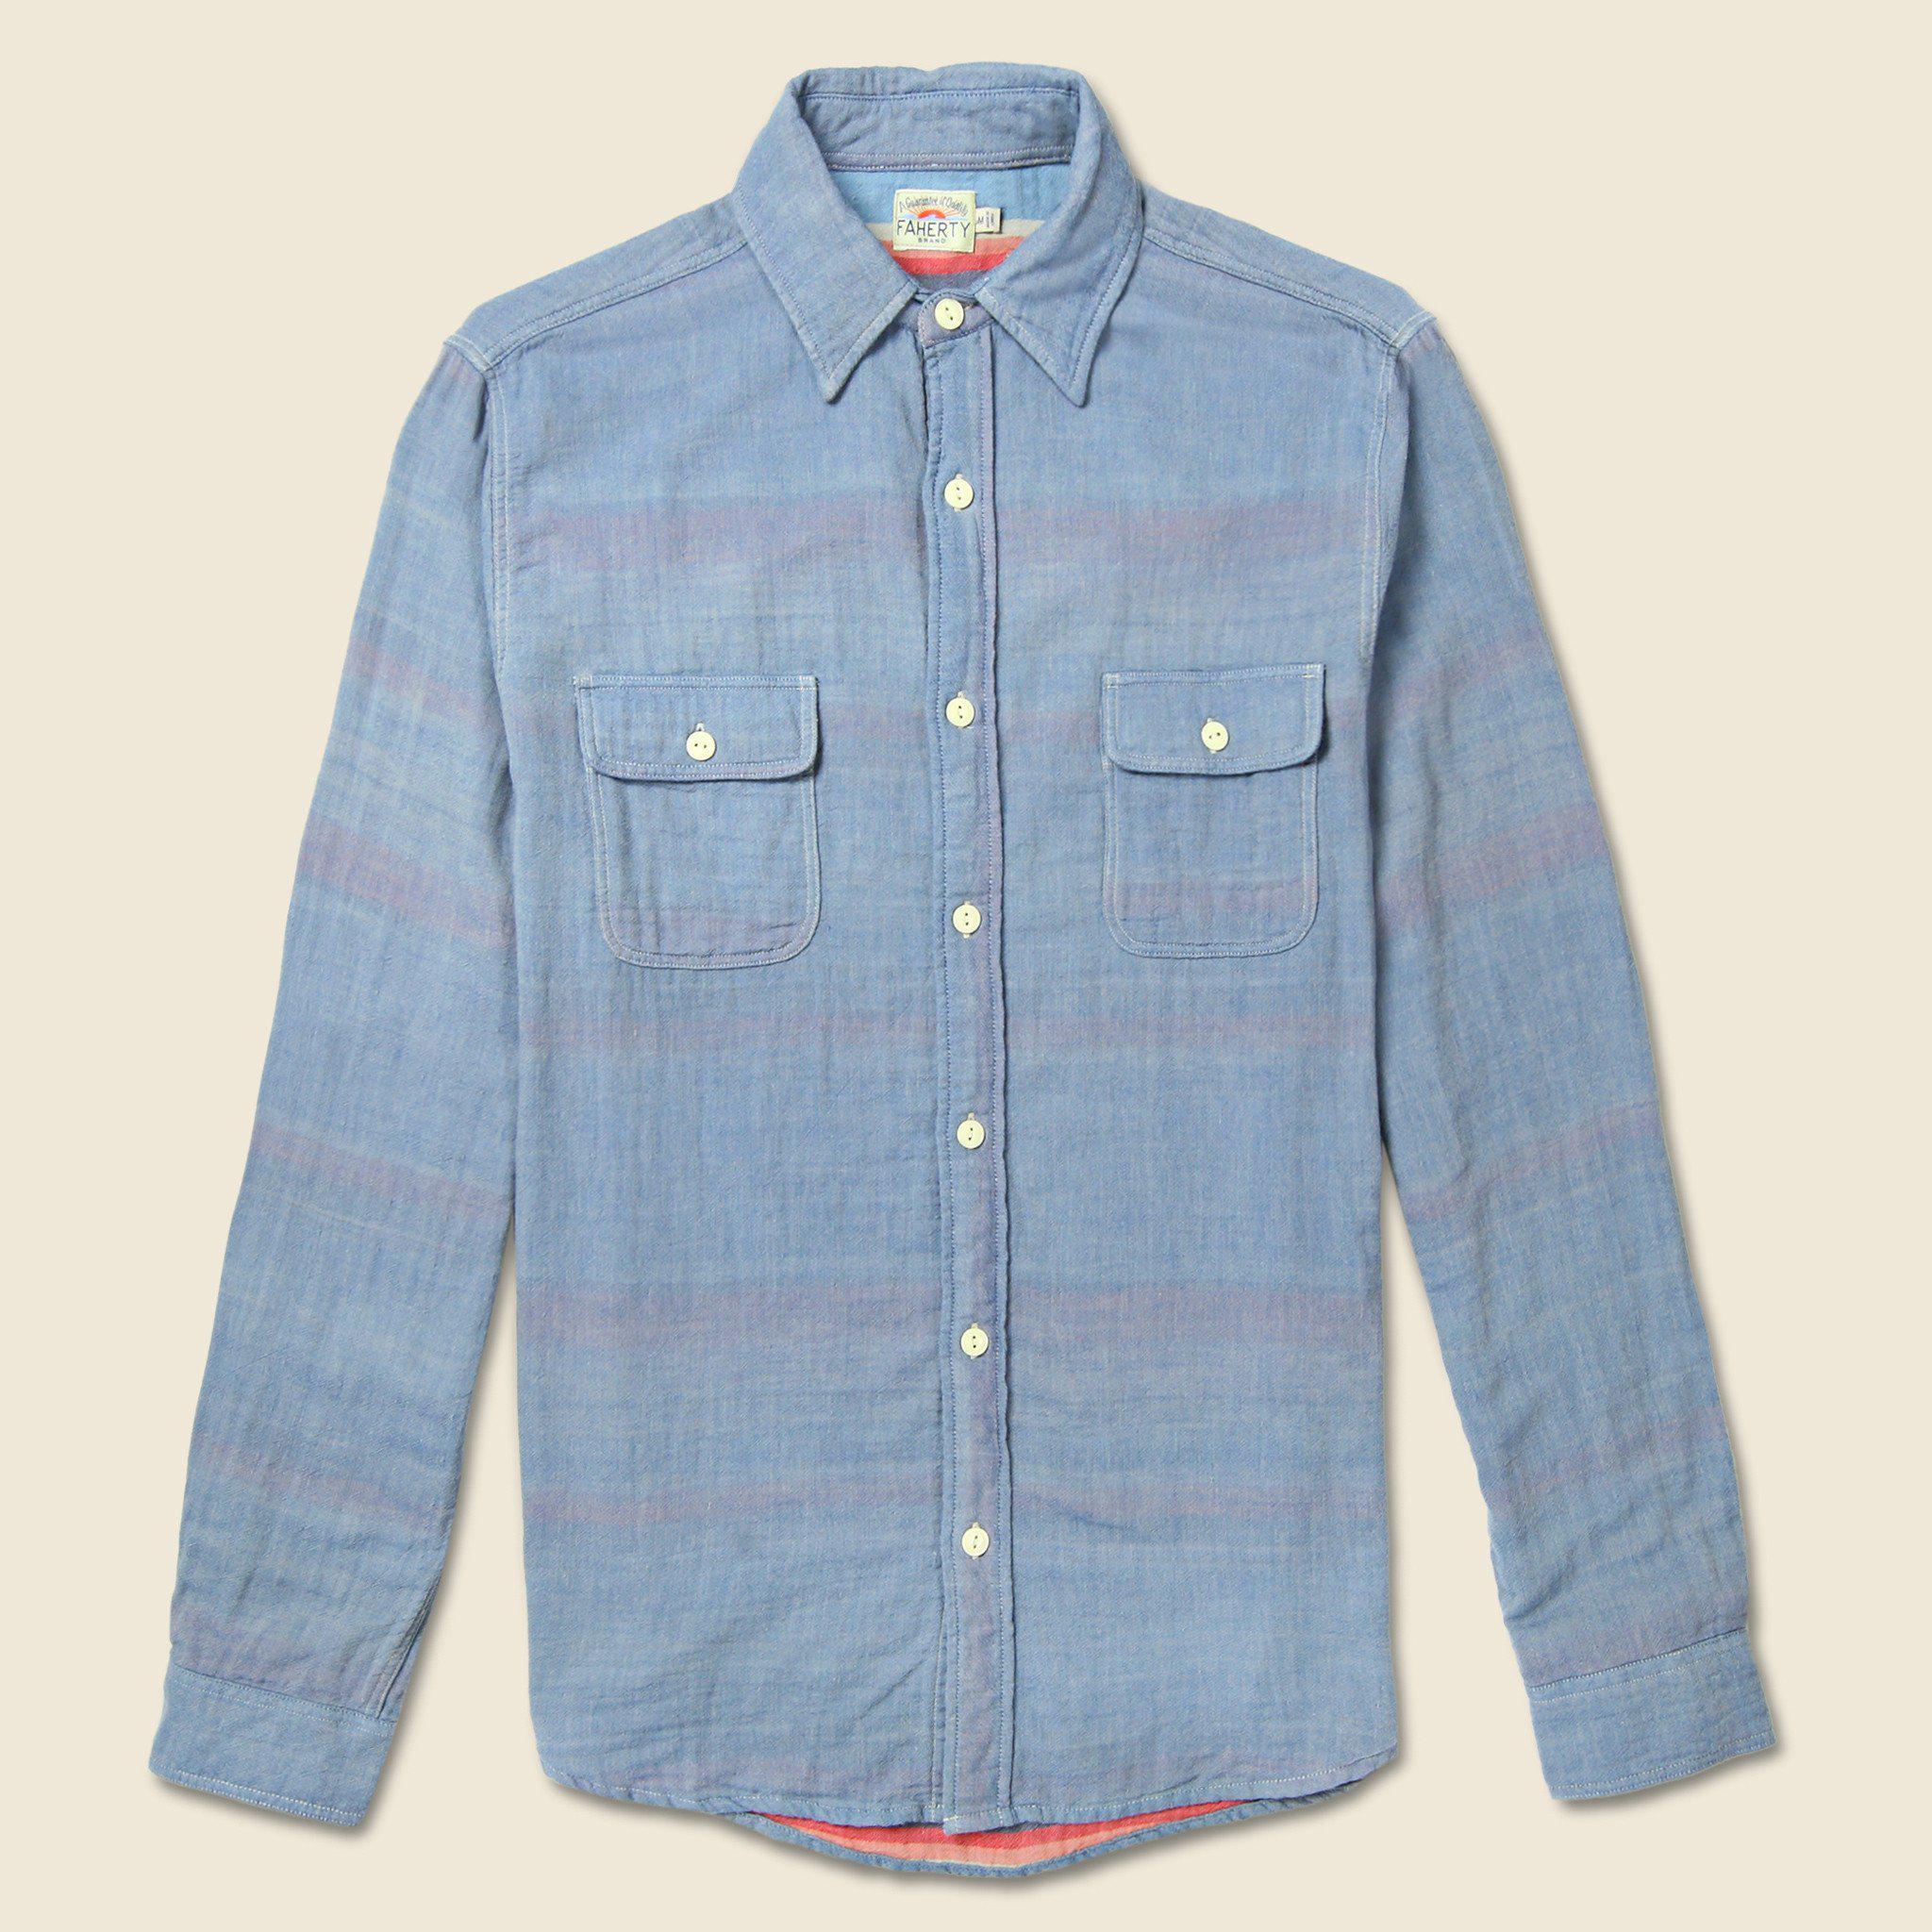 d8f325d869 Lyst - Faherty Brand Belmar Workshirt - Turquoise serape in Blue for Men